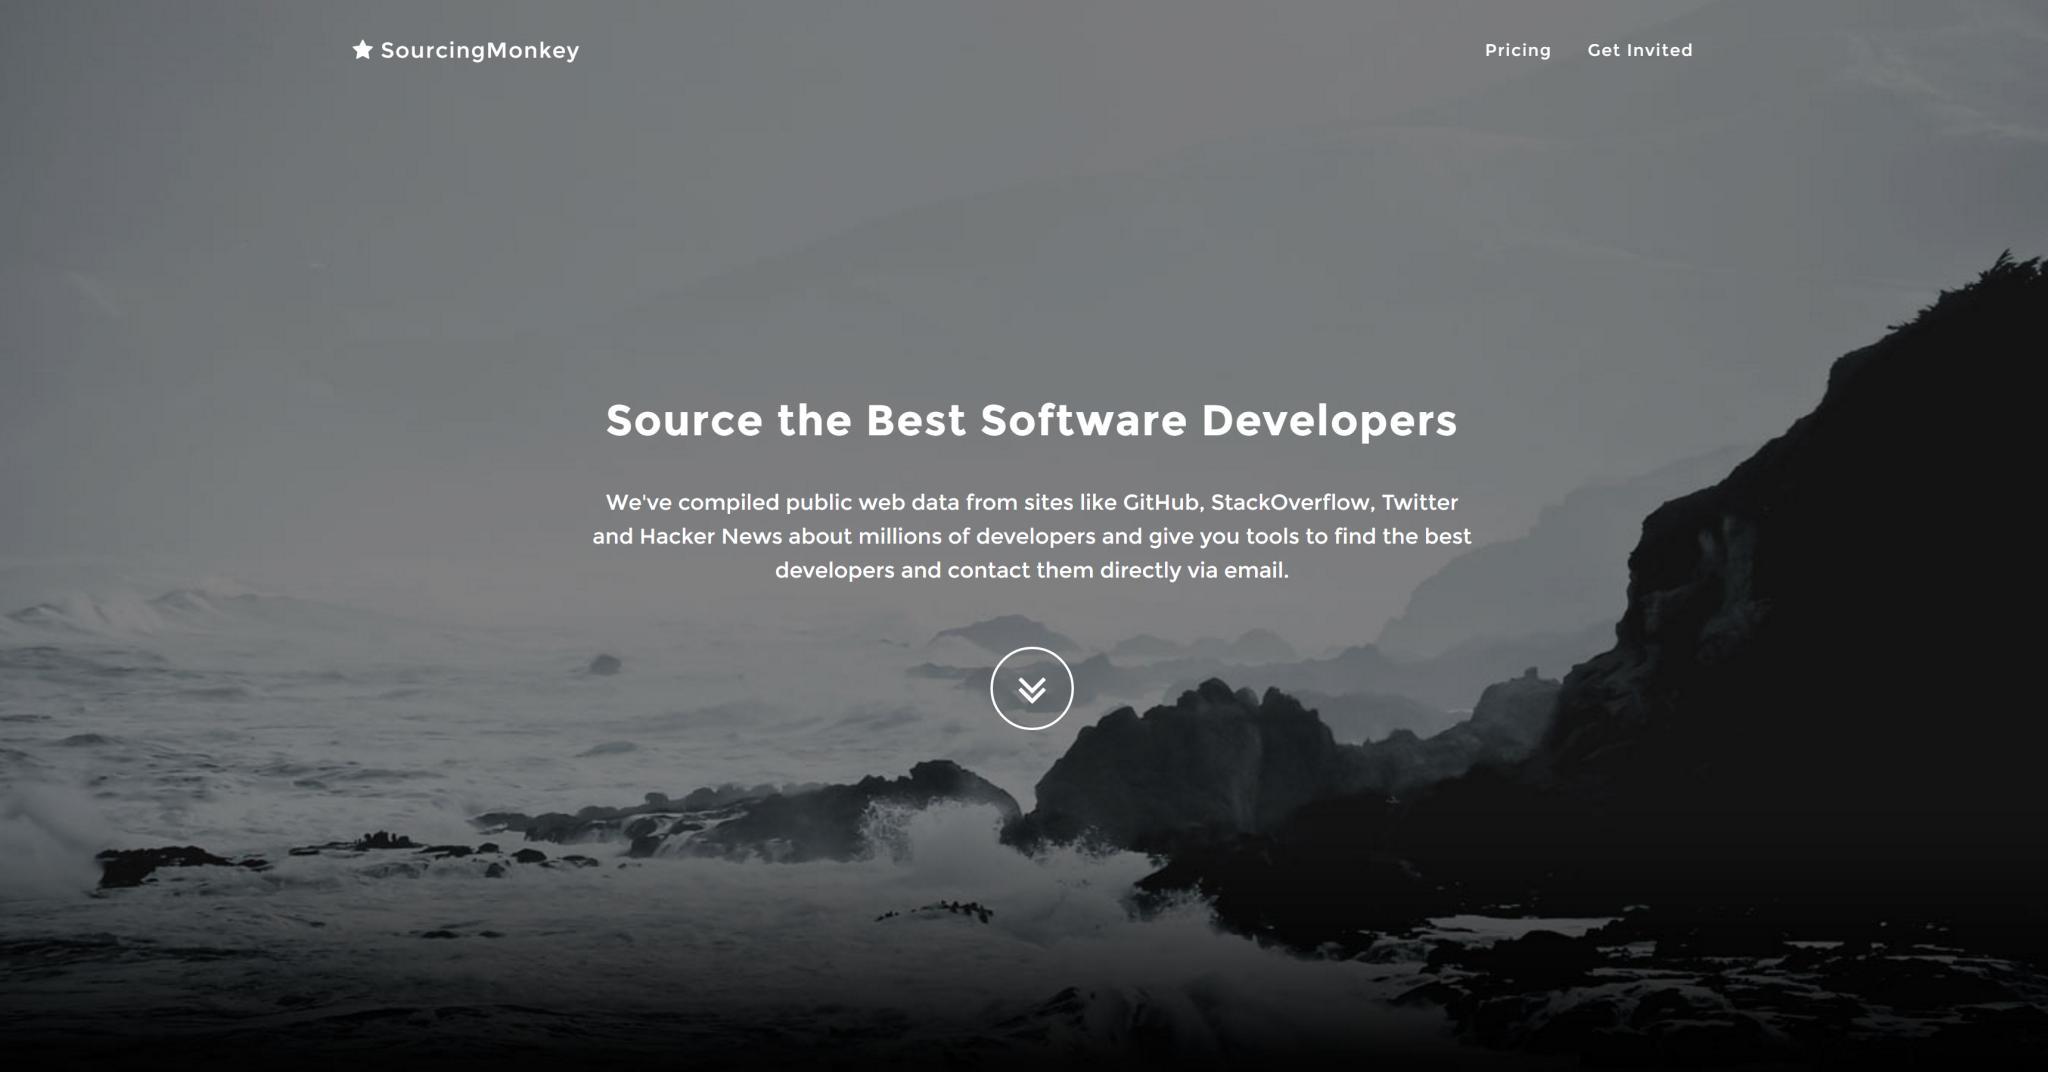 SourcingMonkey.com